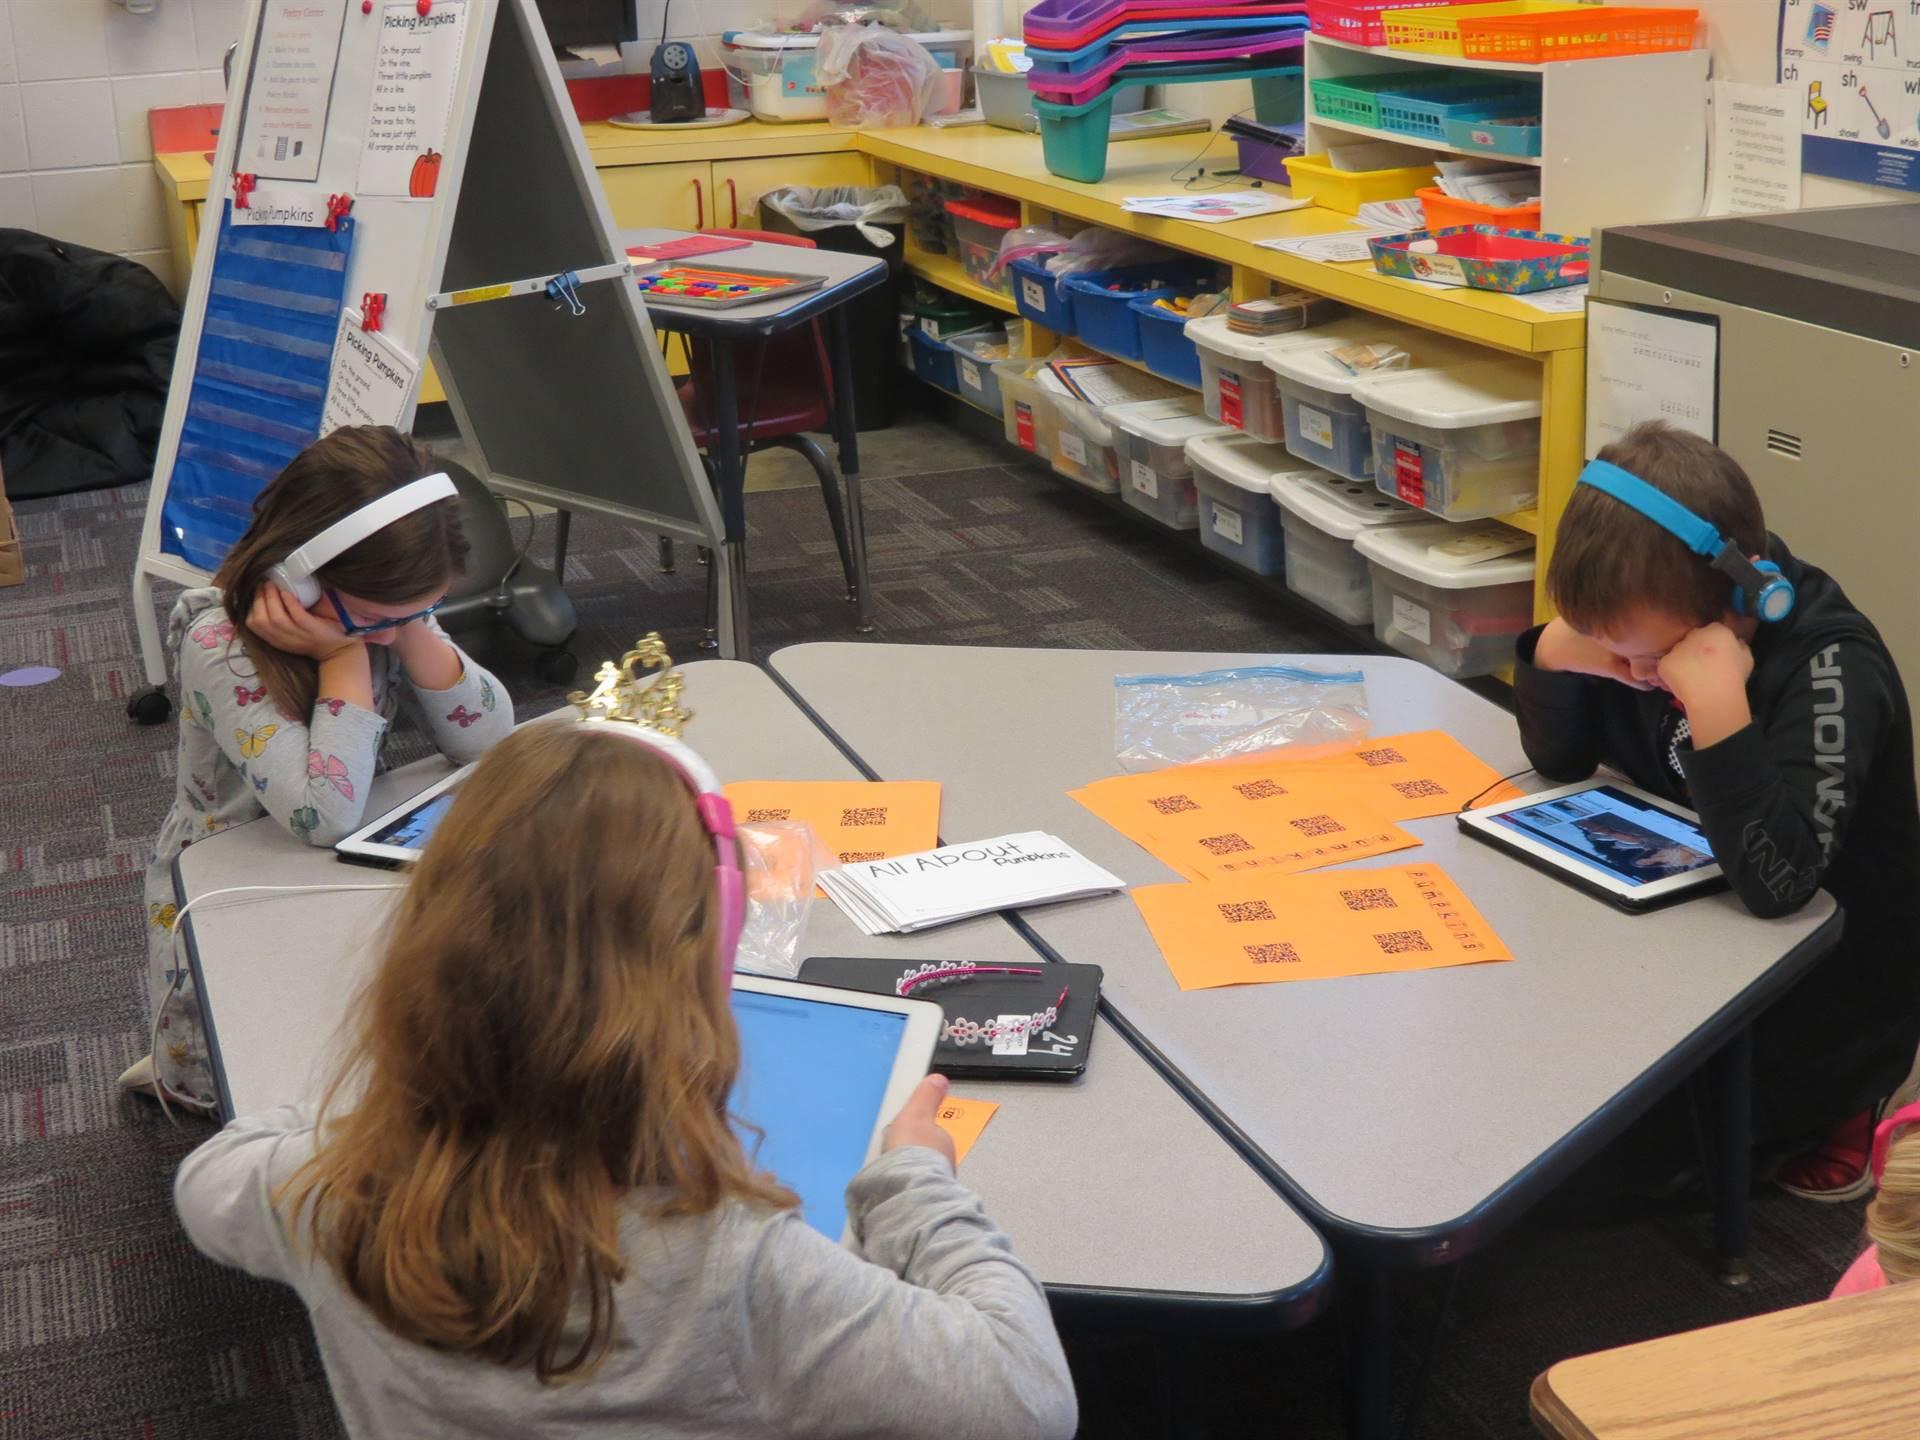 Elementary students using technology